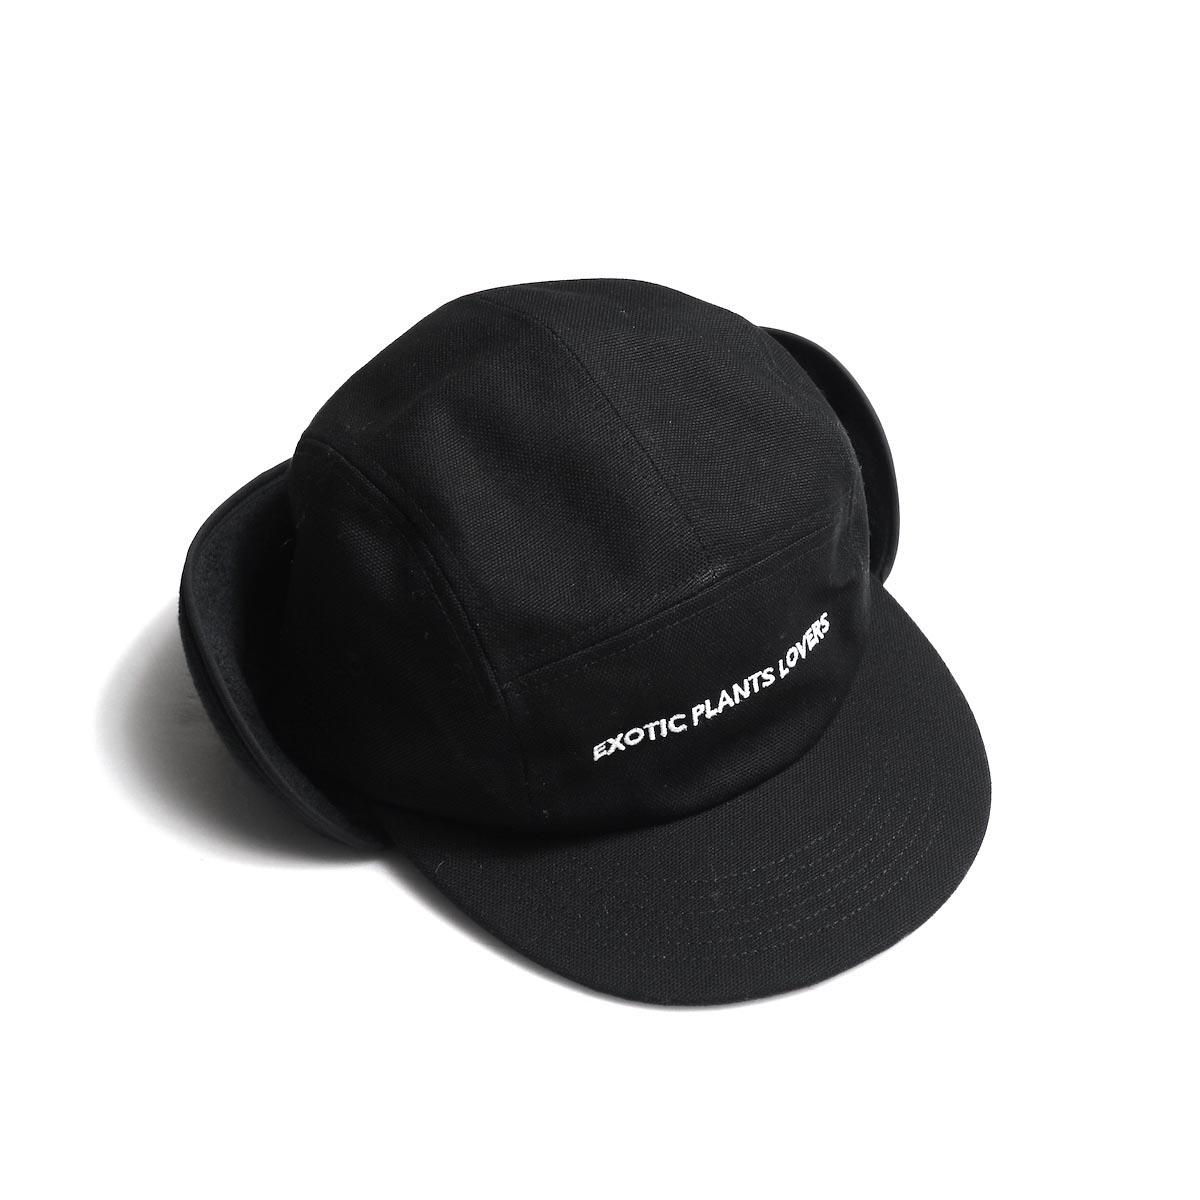 BOTANIZE / 【EXOTIC PLANTS LOVERS】 EAR FLAP CAP